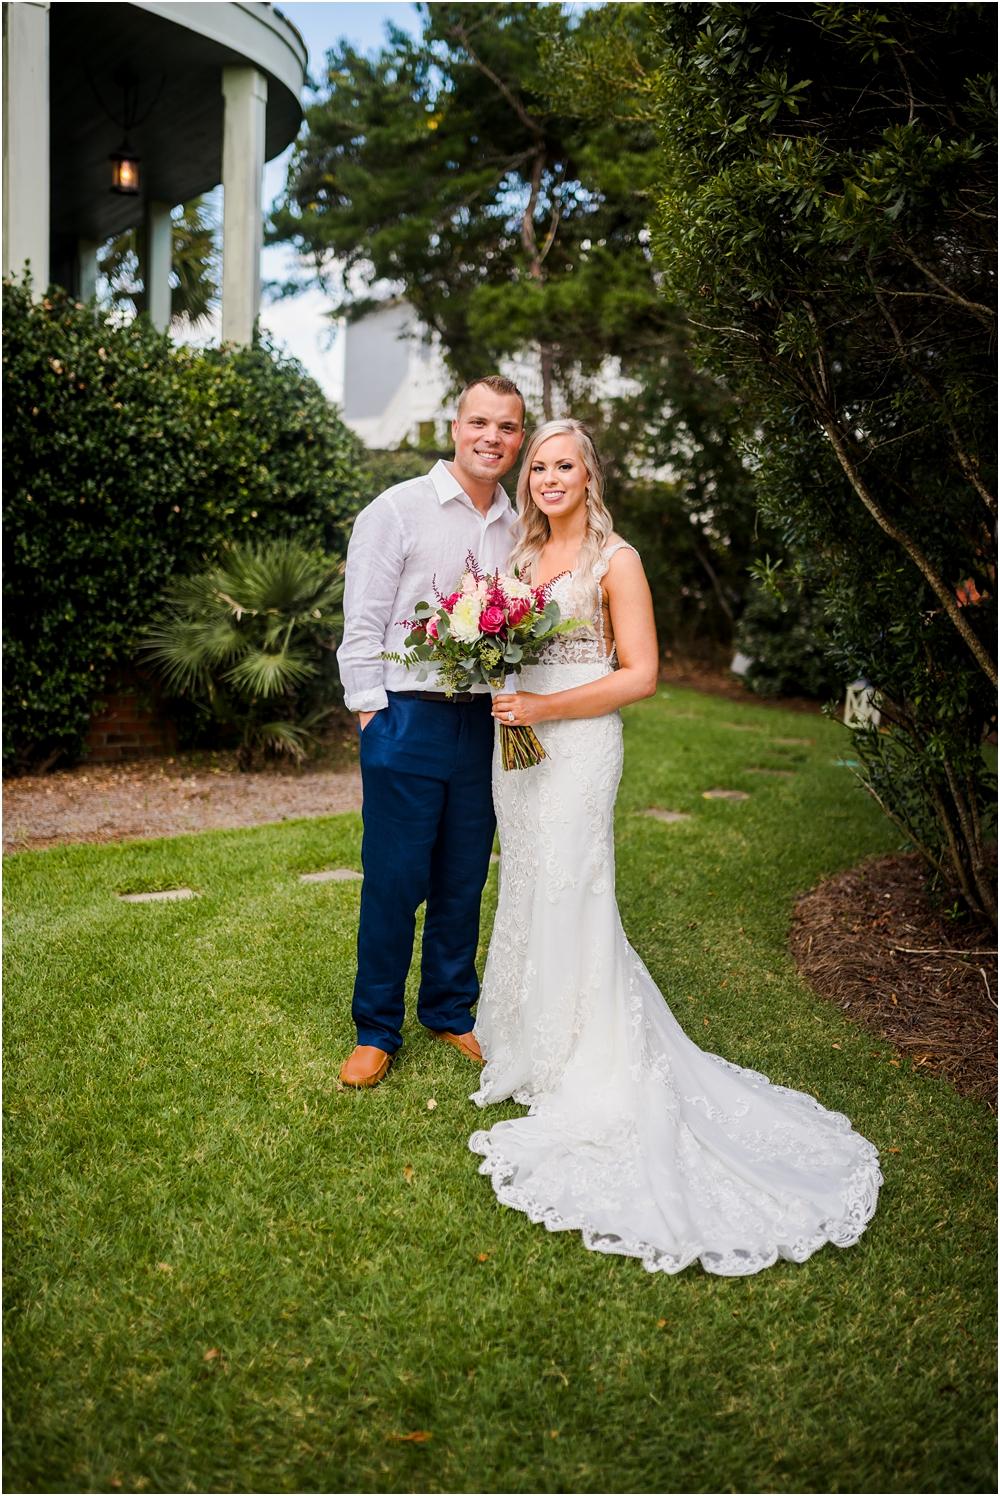 mcglothlin-wedding-kiersten-stevenson-photography-30a-panama-city-beach-dothan-tallahassee-(62-of-145).jpg